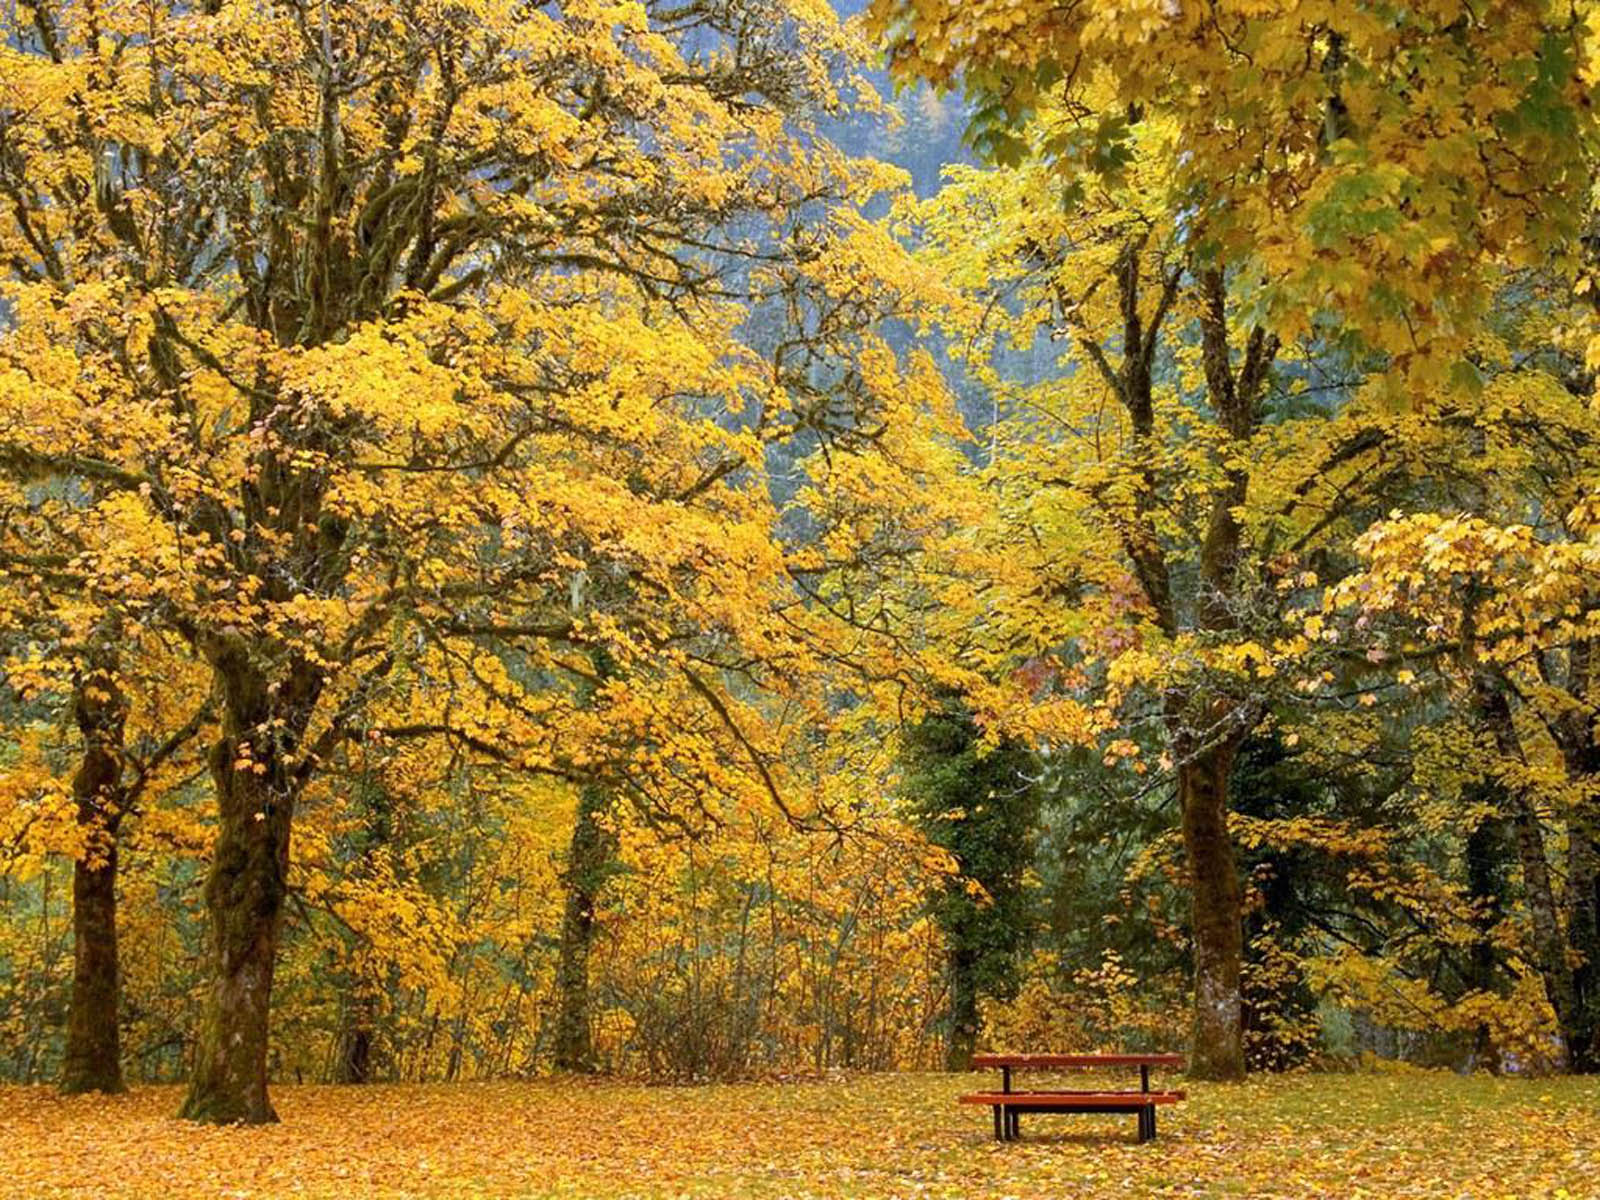 Autumn Scenery Wallpapers BeautifulAutumn Scenery Desktop Wallpapers 1600x1200